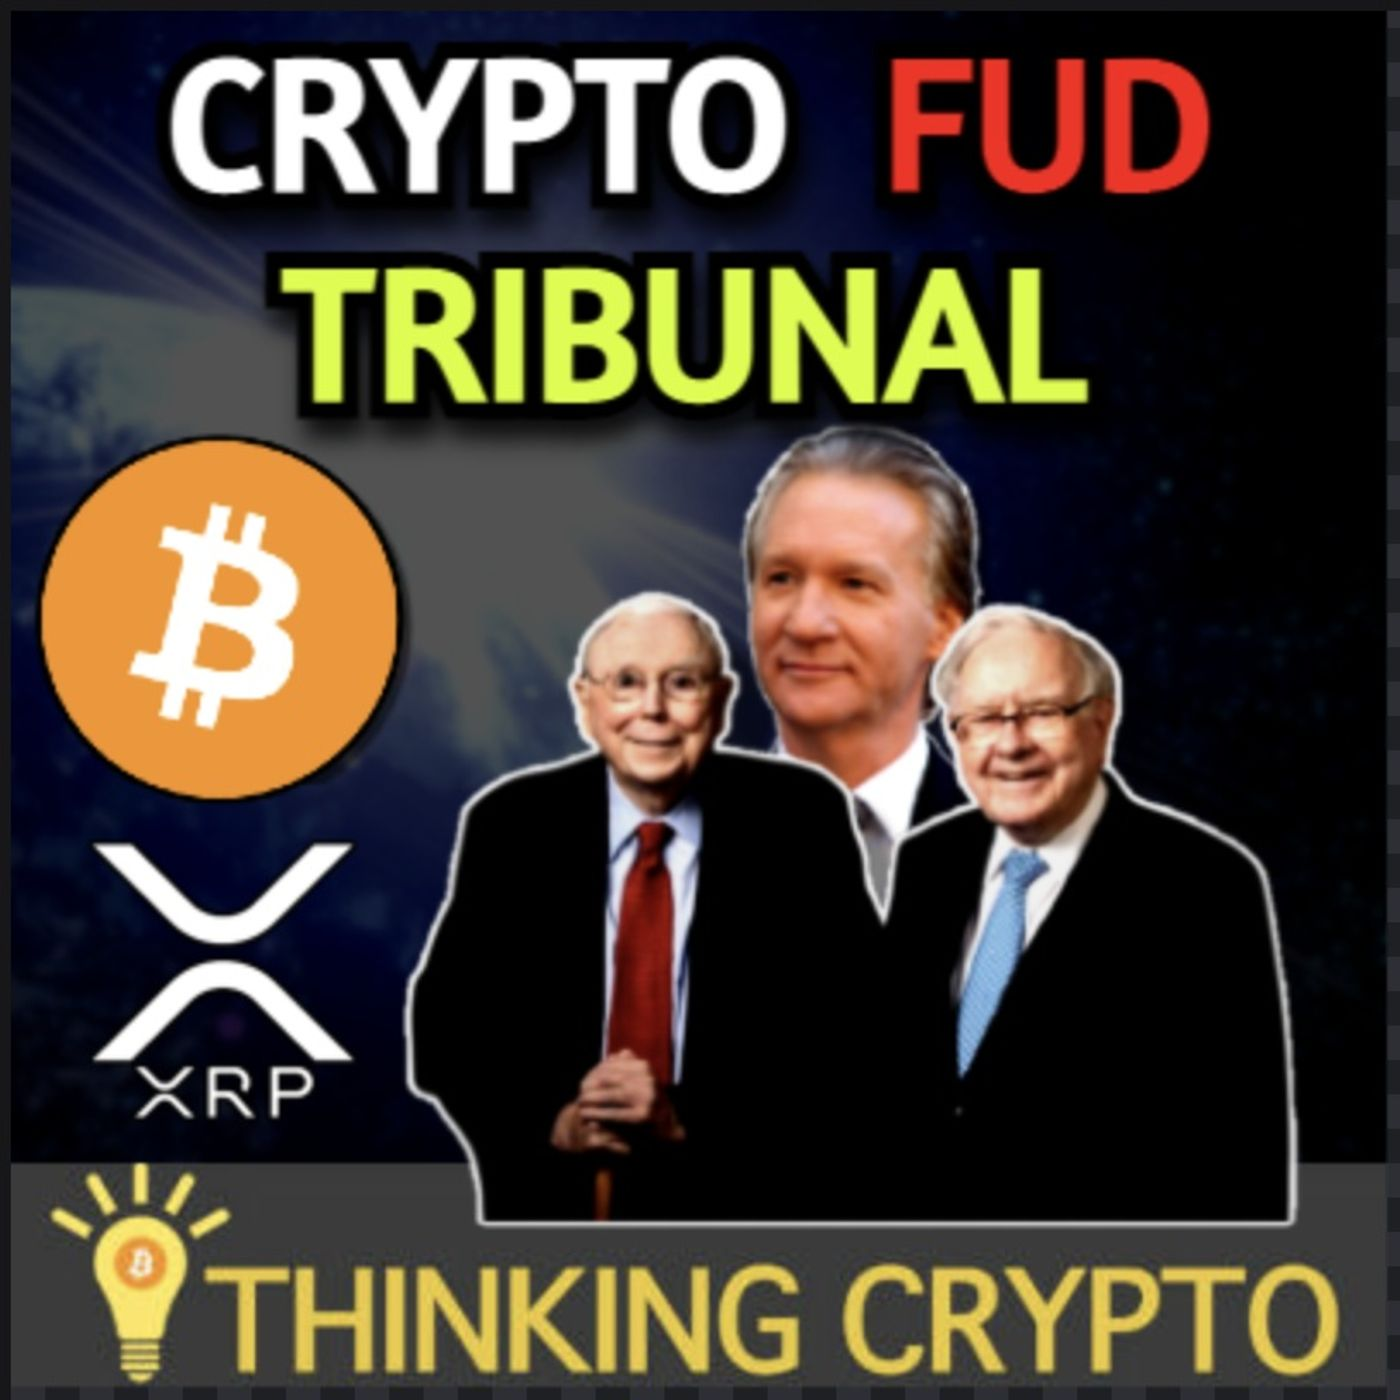 Bill Maher, Charlie Munger, & Warren Buffett Crypto FUD - Peter Brandt XRP Bull - Bitcoin Taproot